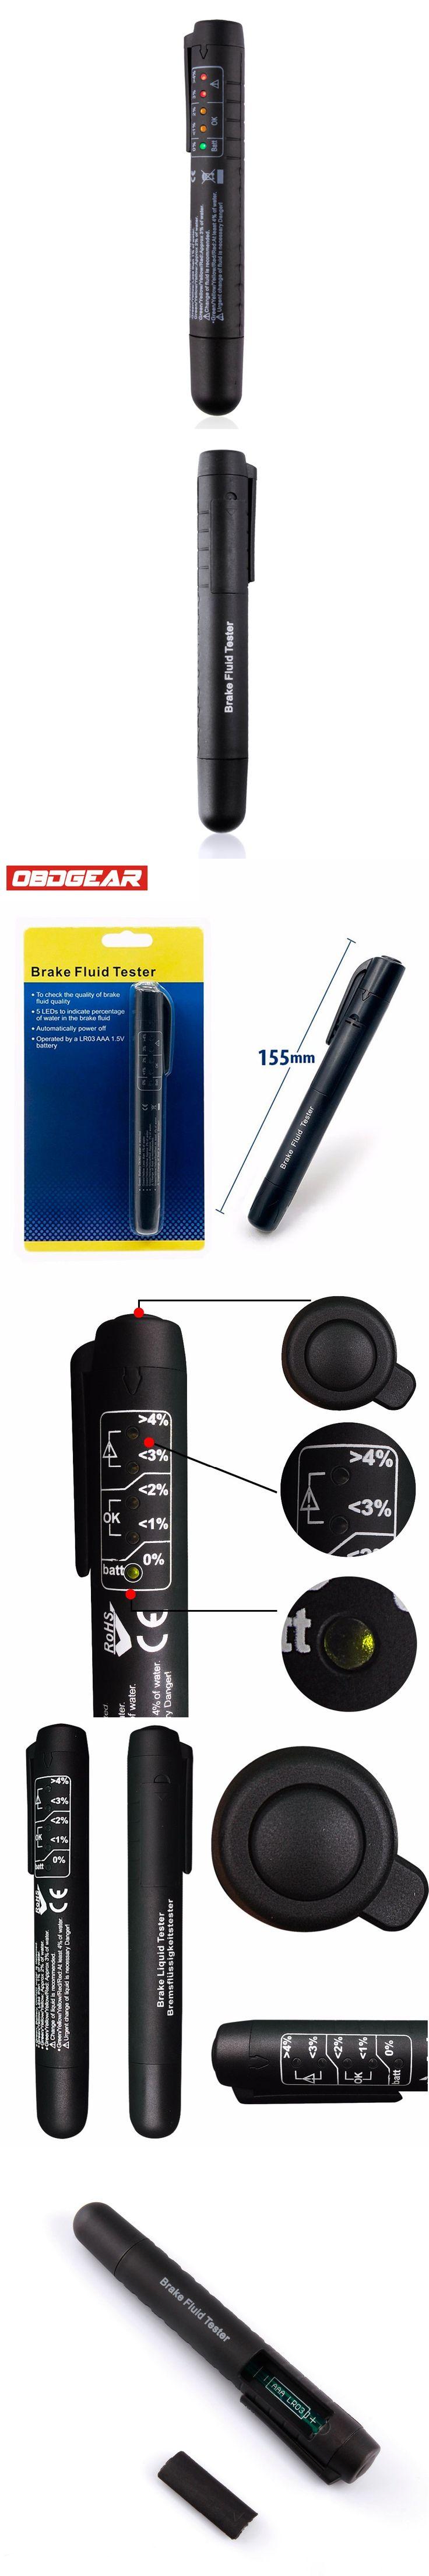 Brake Fluid Liquid Tester Pen With 5 LED Car Auto Vehicle Tools Car Vehicle Auto Automotive Diagnostic Tool For DOT3/DOT4 Auto